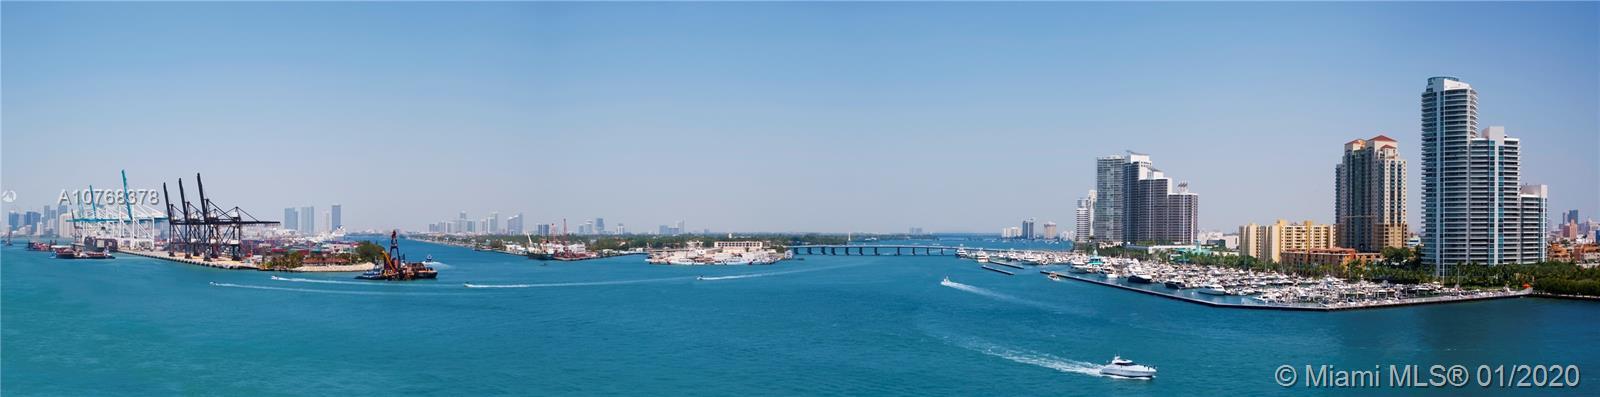 6891 Fisher Island Dr 6891, Miami Beach, FL 33109